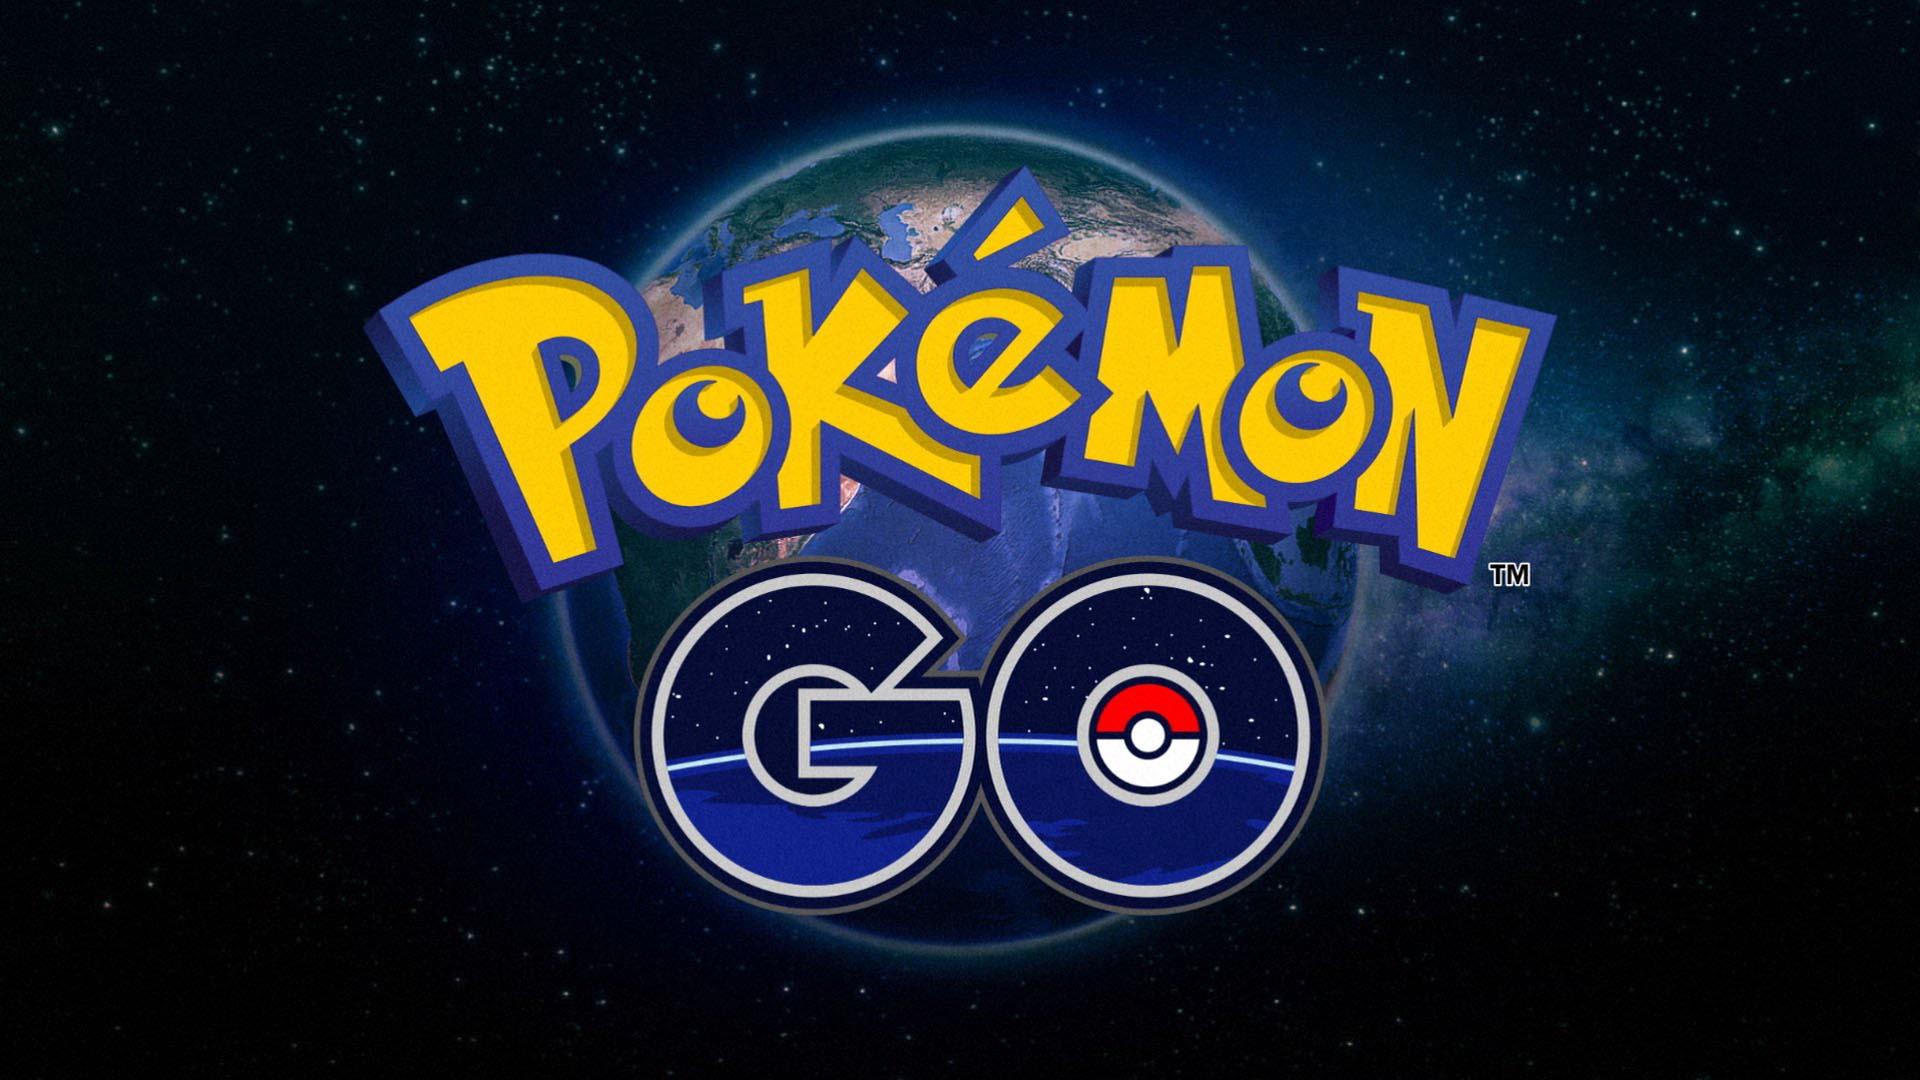 Safety precautions while playing Pokémon Go